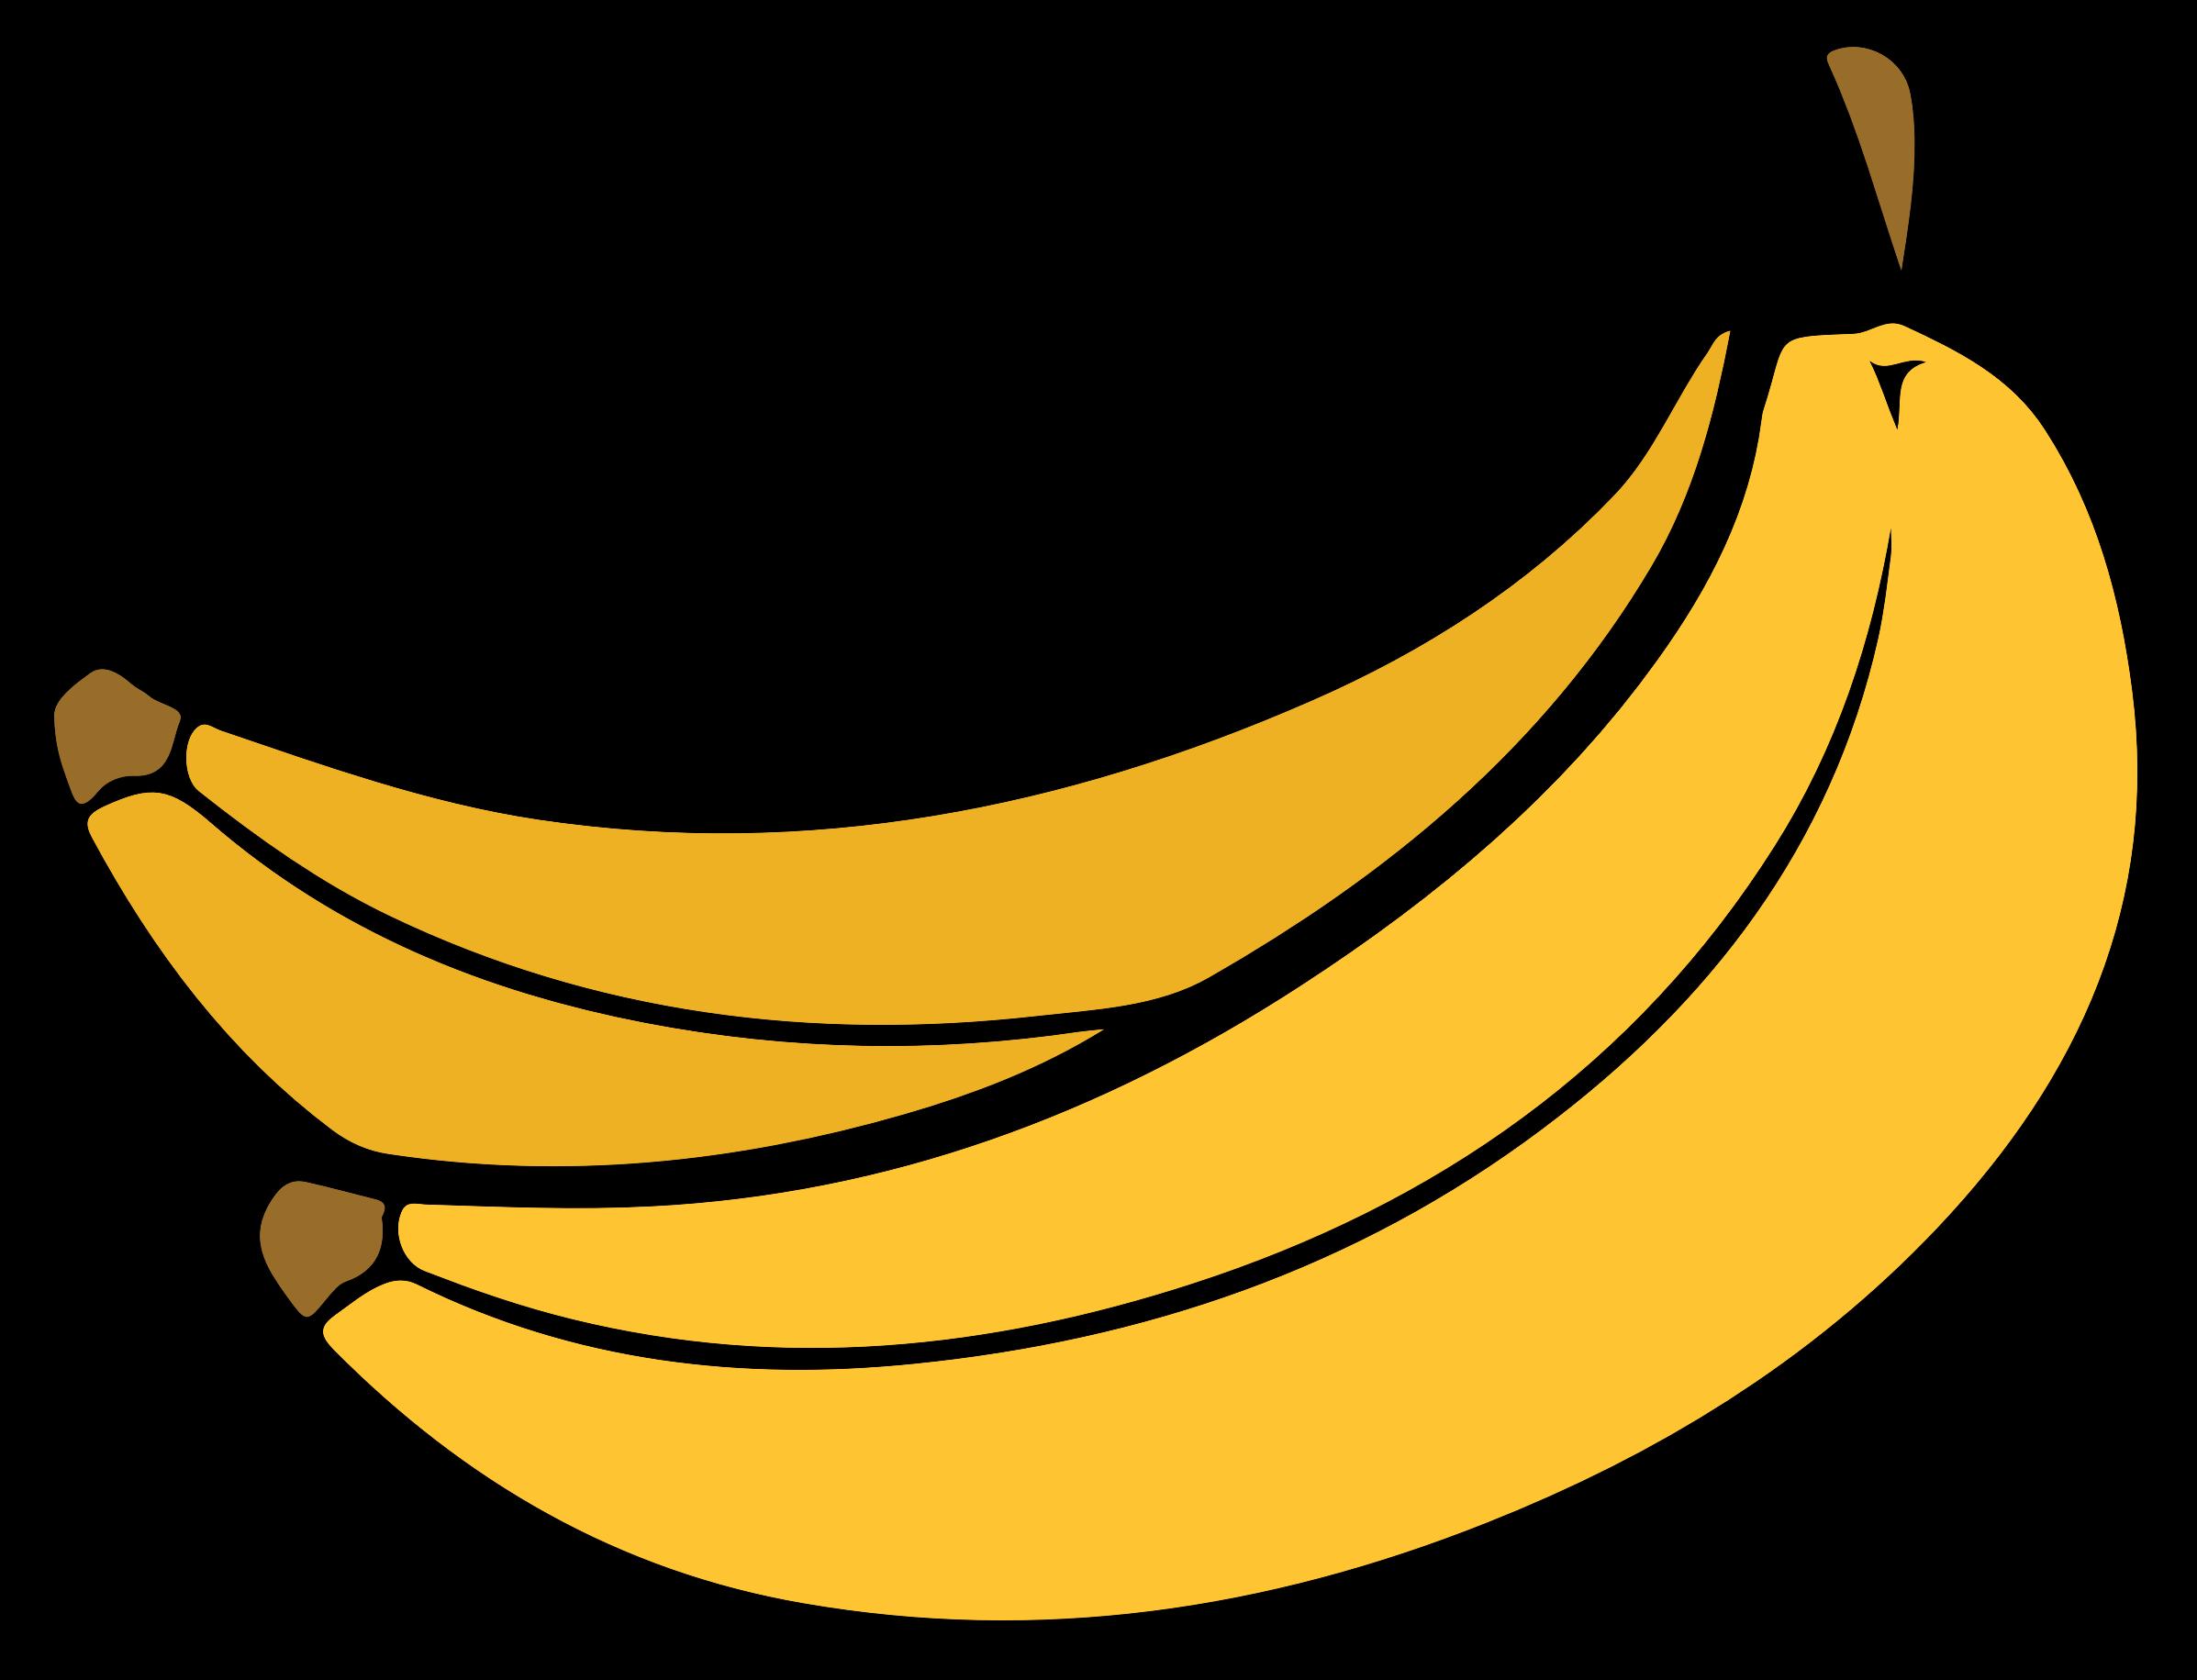 Grape banana